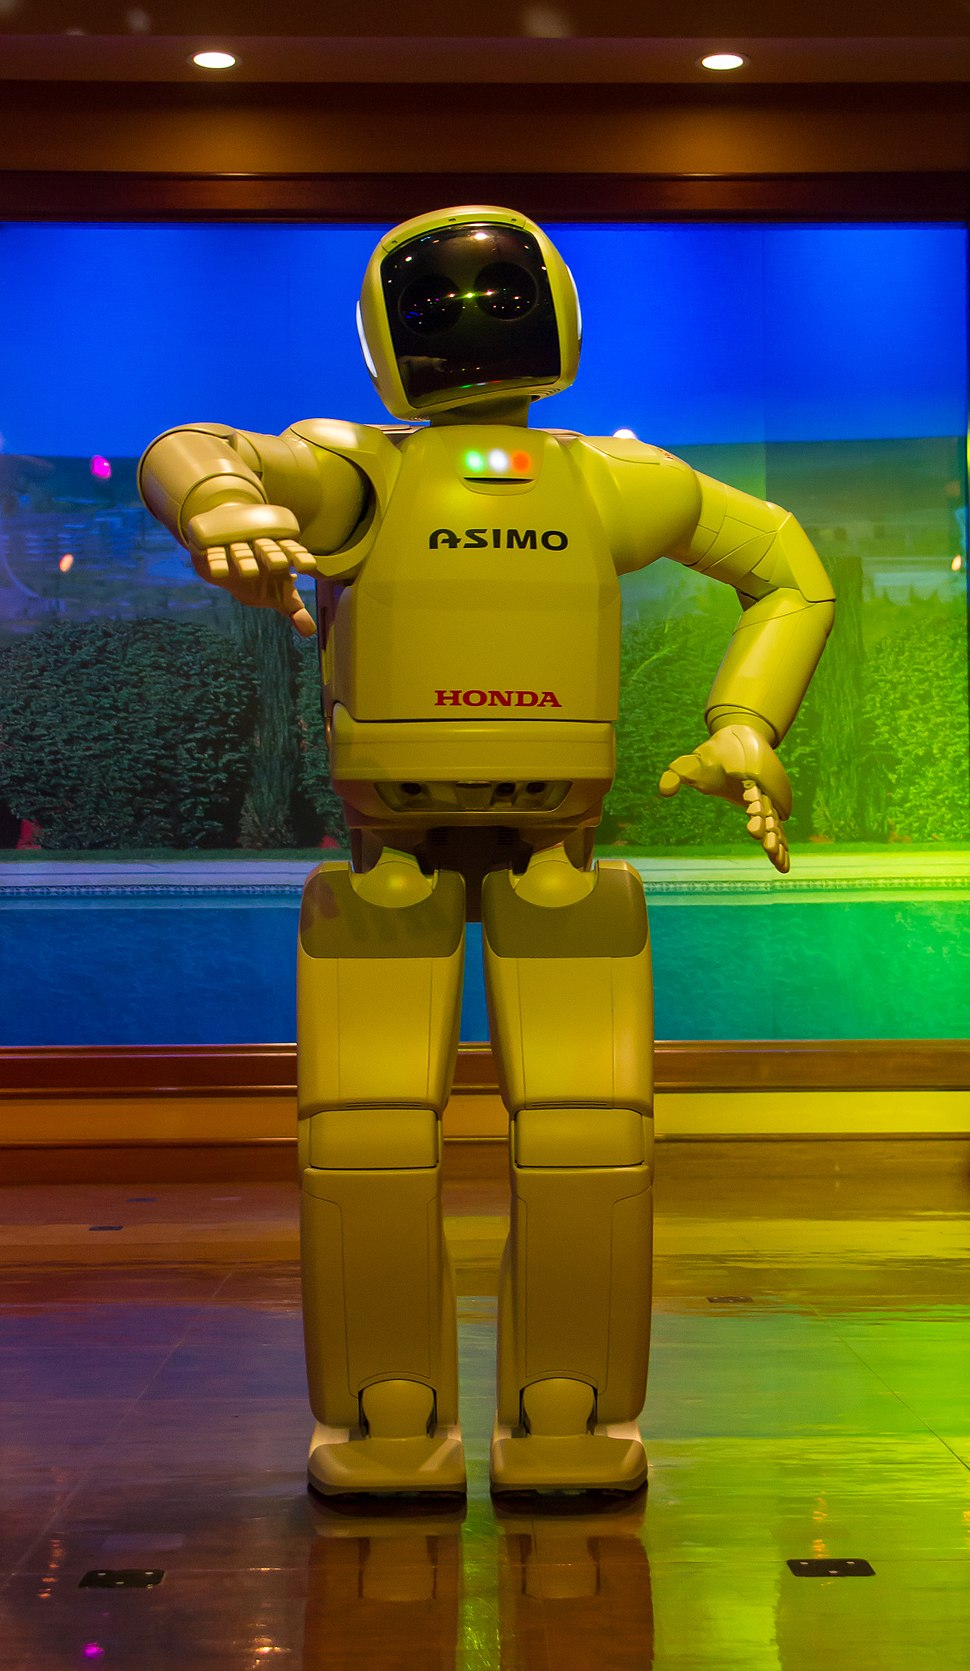 USA - California - Dysneyland - Asimo Robot - 4